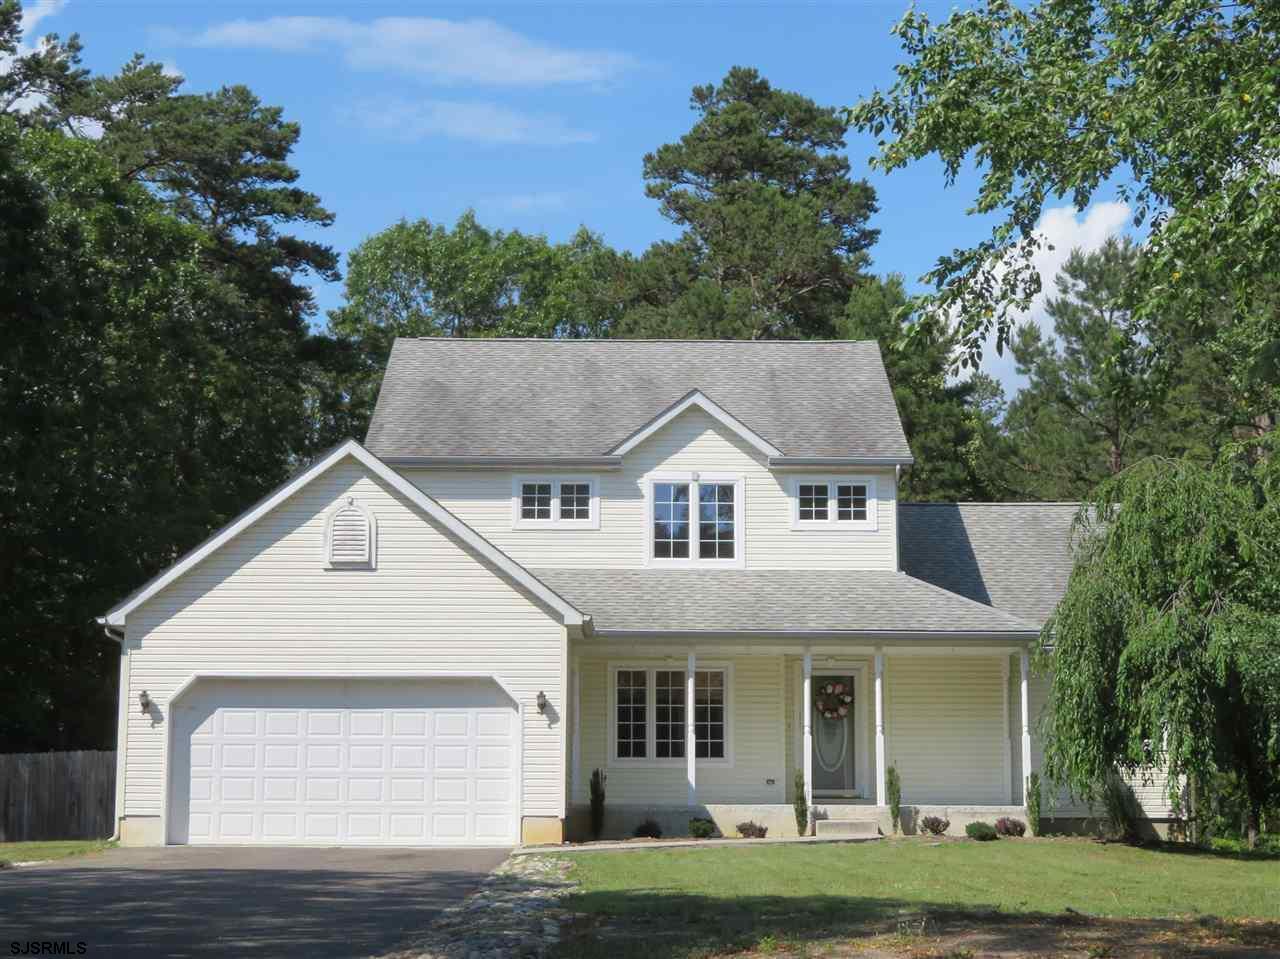 605 Whispering Woods Ct, Mays Landing, NJ, 08330